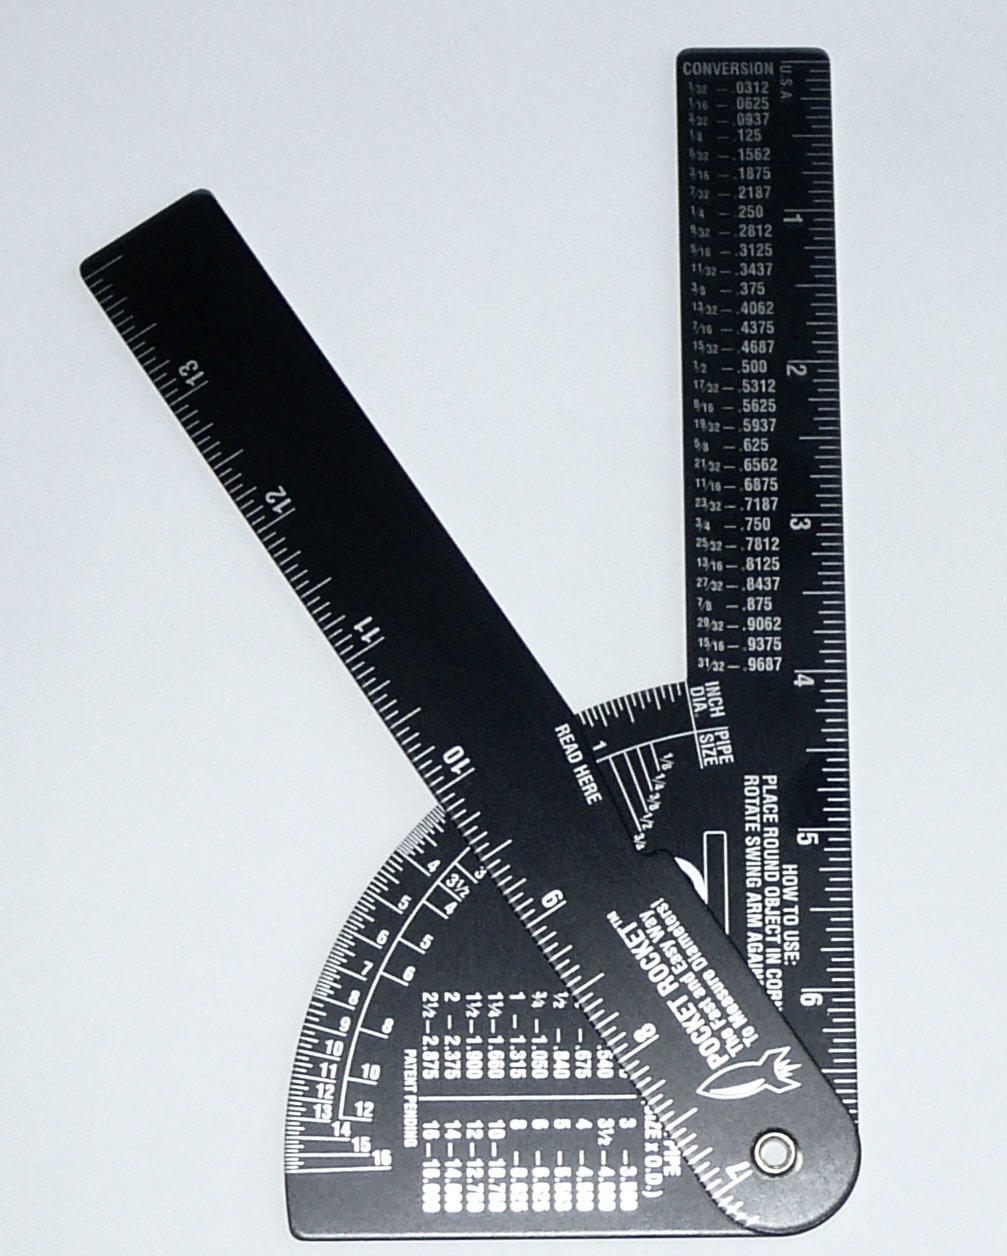 Pocket Rocket: Pipe / Diameter Caliper and Ruler - Fractional – Black Anodized Aluminum